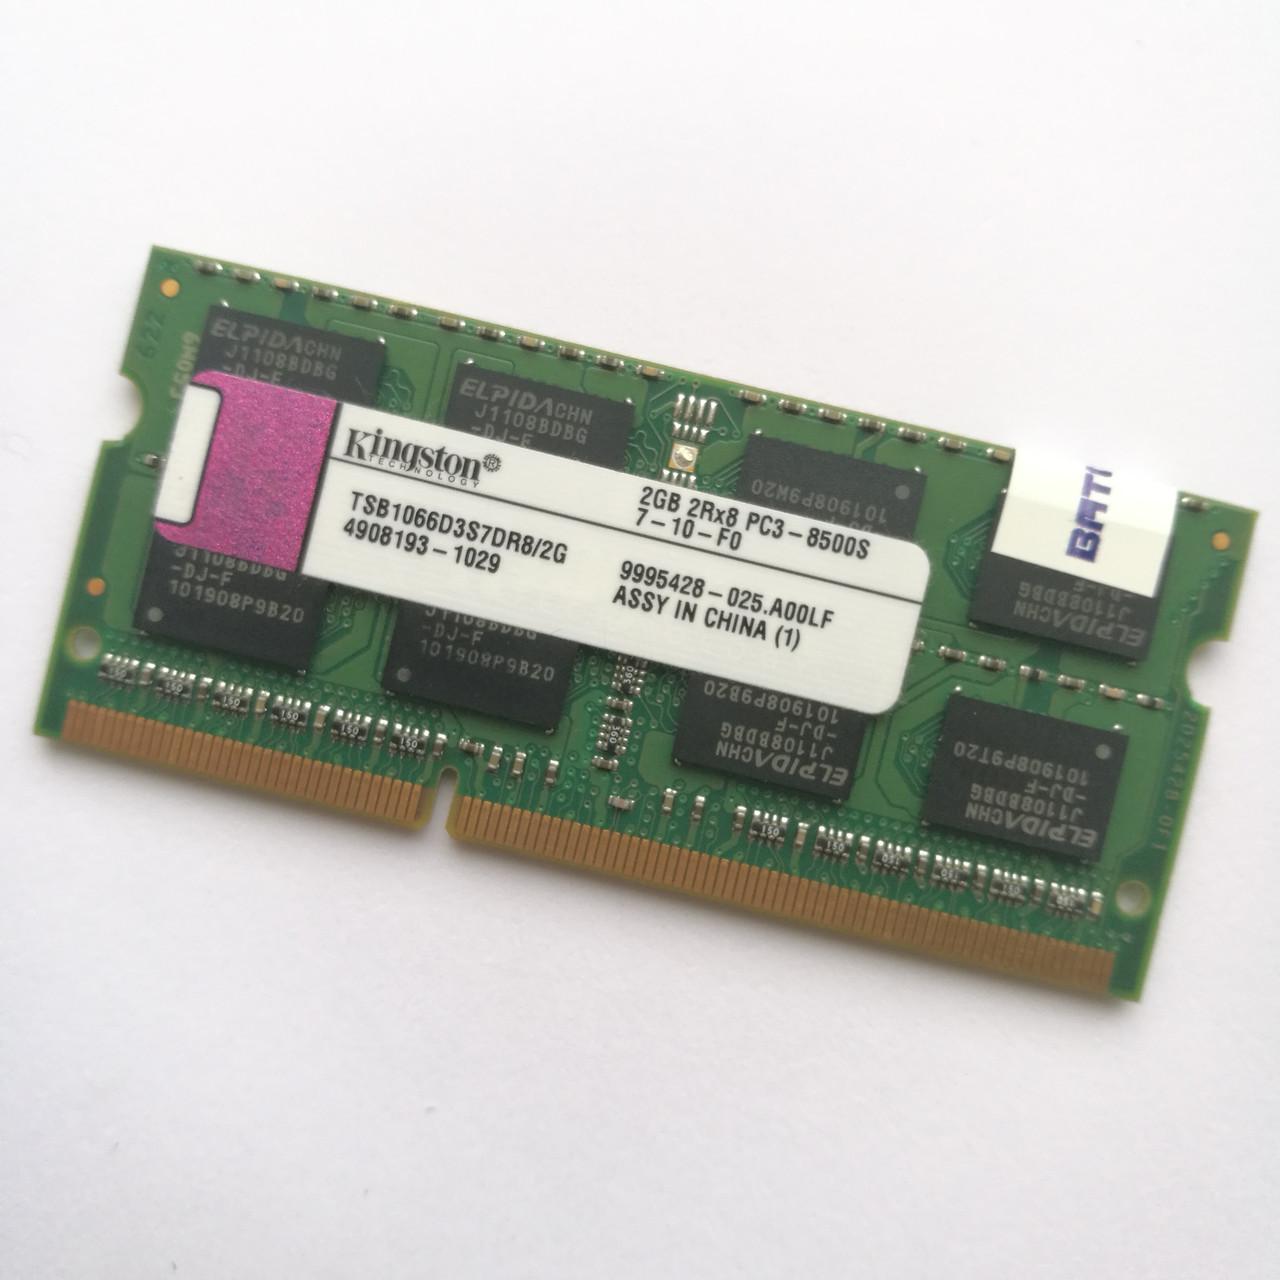 Оперативная память для ноутбука Kingston SODIMM DDR3 2Gb 1066MHz 8500S CL7 (TSB1066D3S7DR8/2G) Б/У